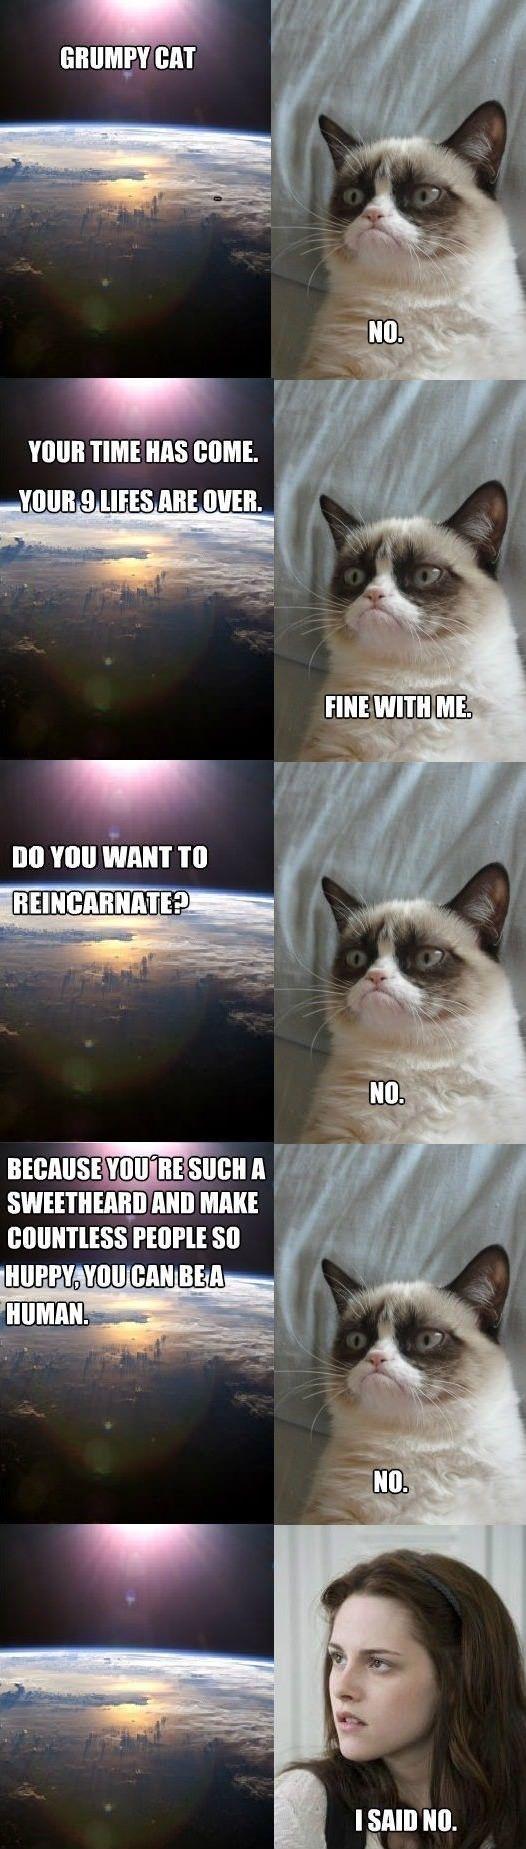 Grumpy cat dies | Truths and Funnies | Grumpy cat humor